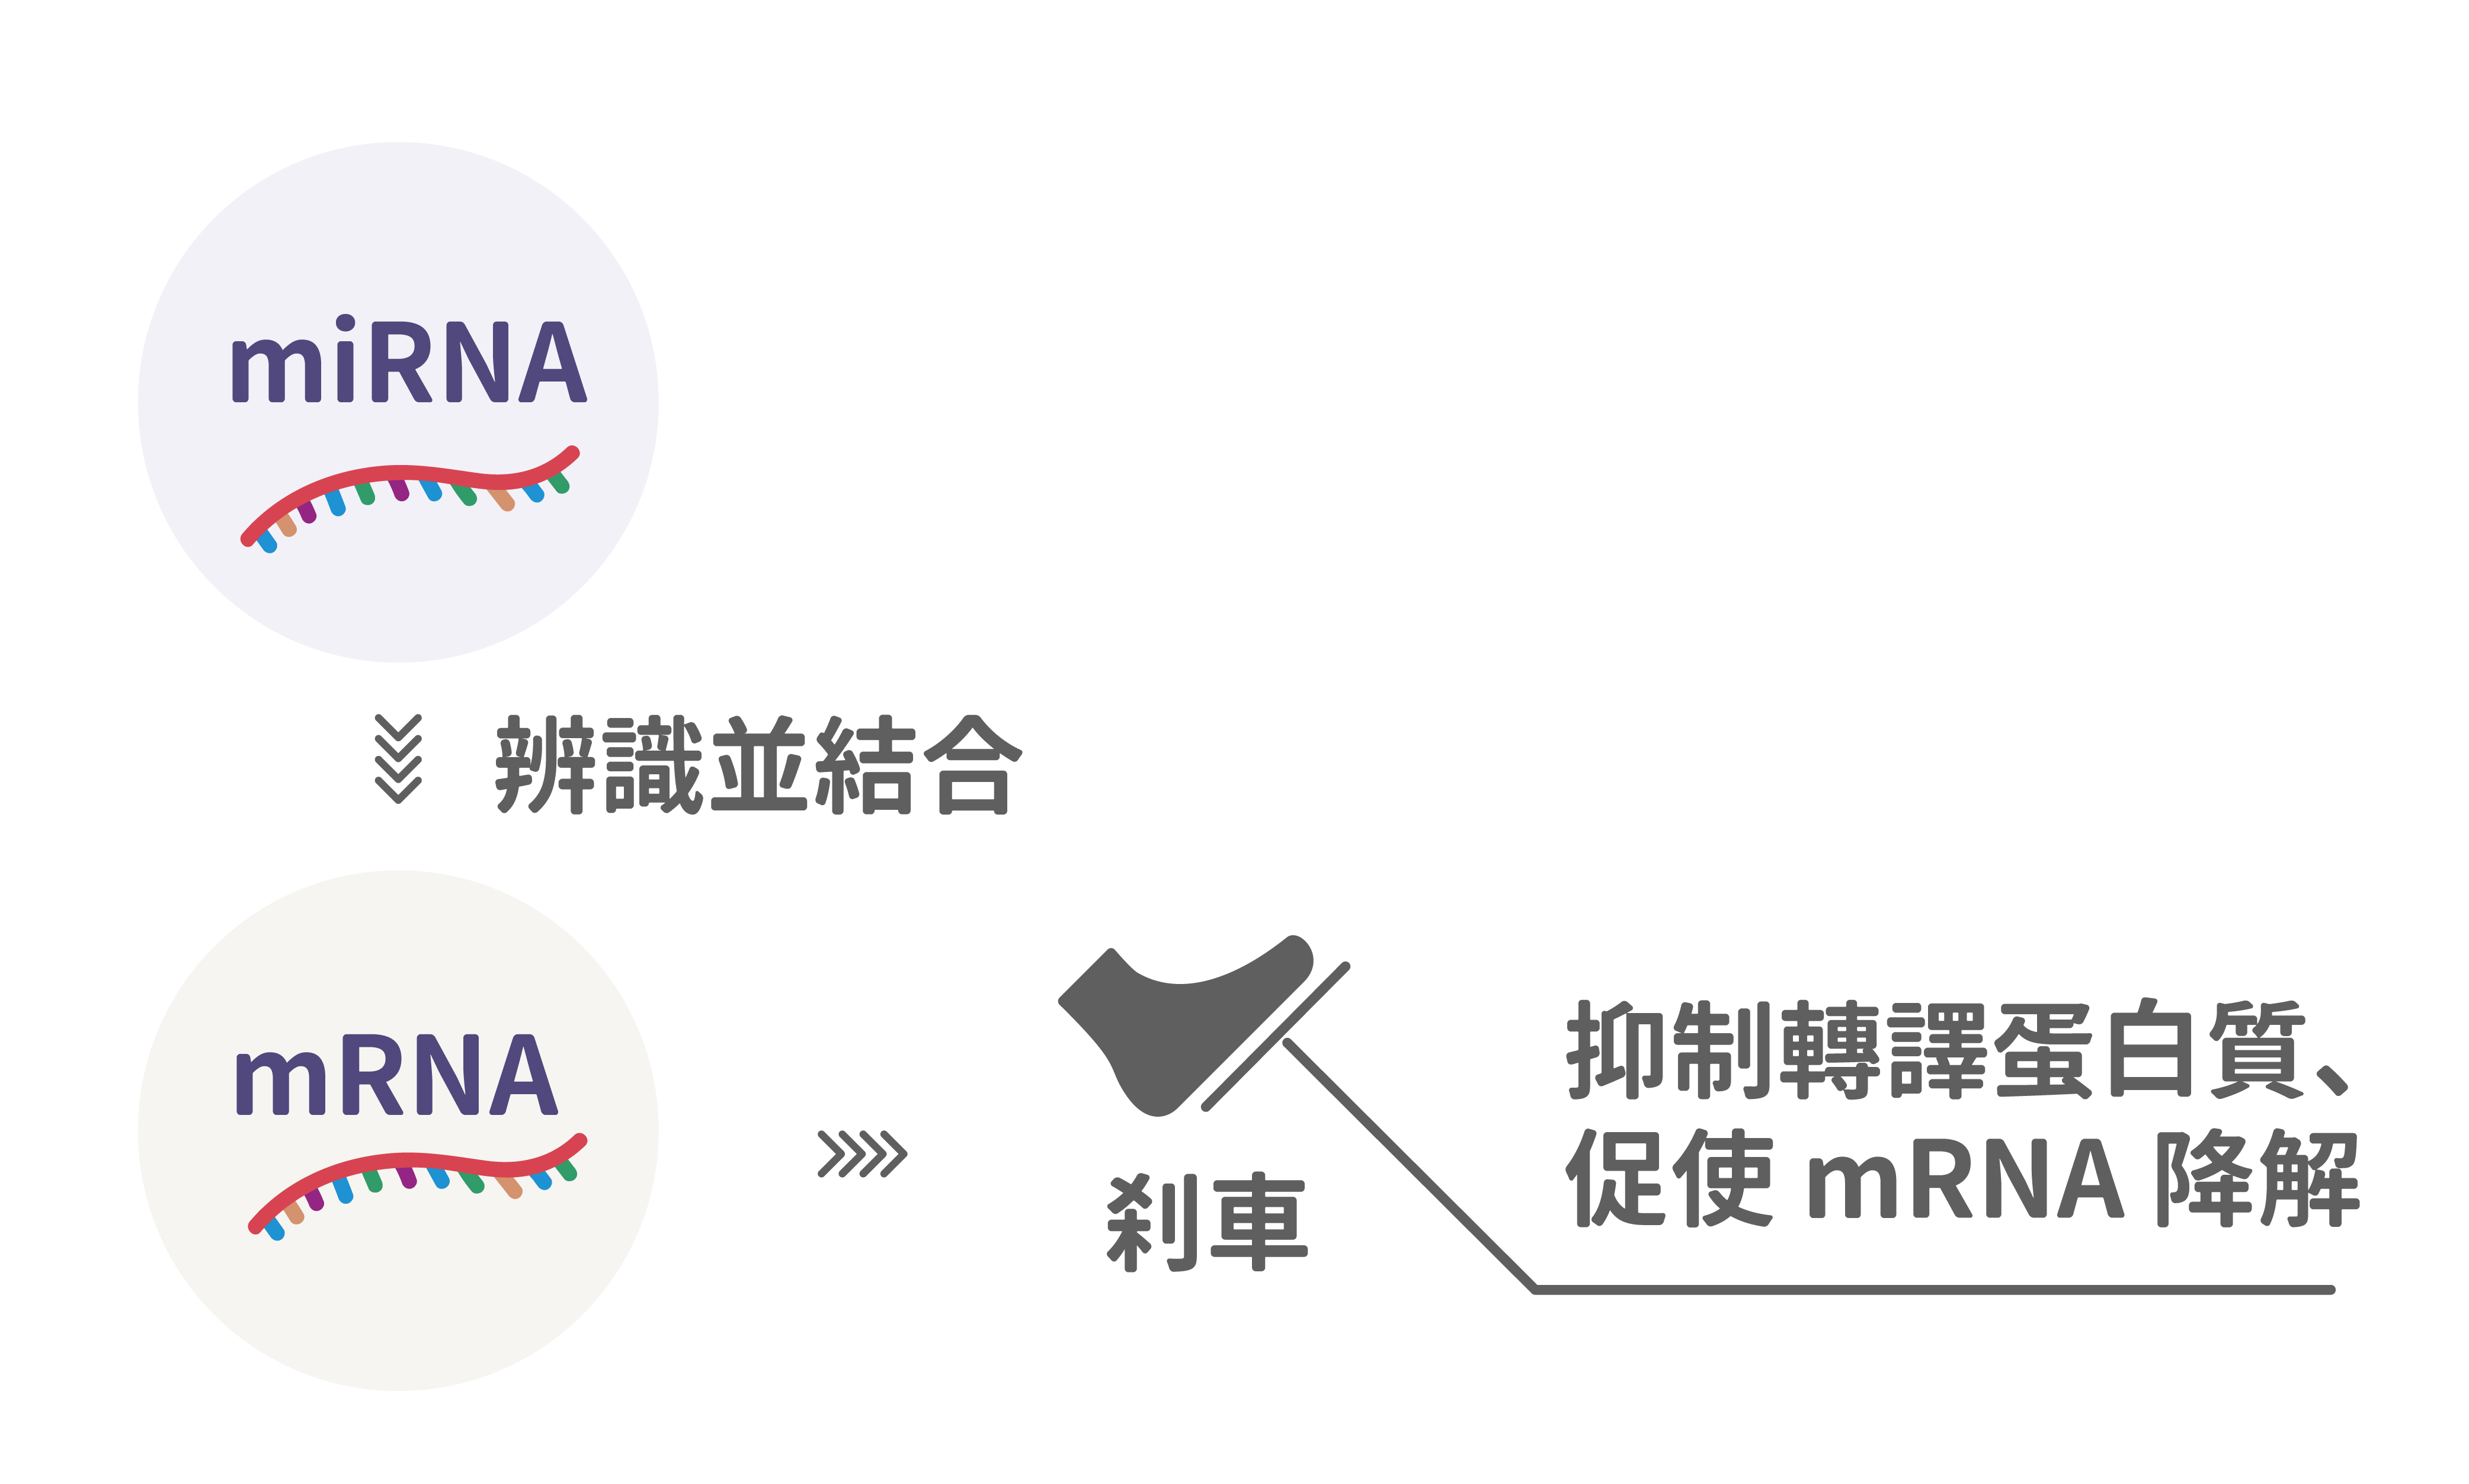 miRNA 彷彿在幫 mRNA 踩剎車,暫停後續轉譯蛋白質,藉此調控基因表現。 圖說設計│張語辰